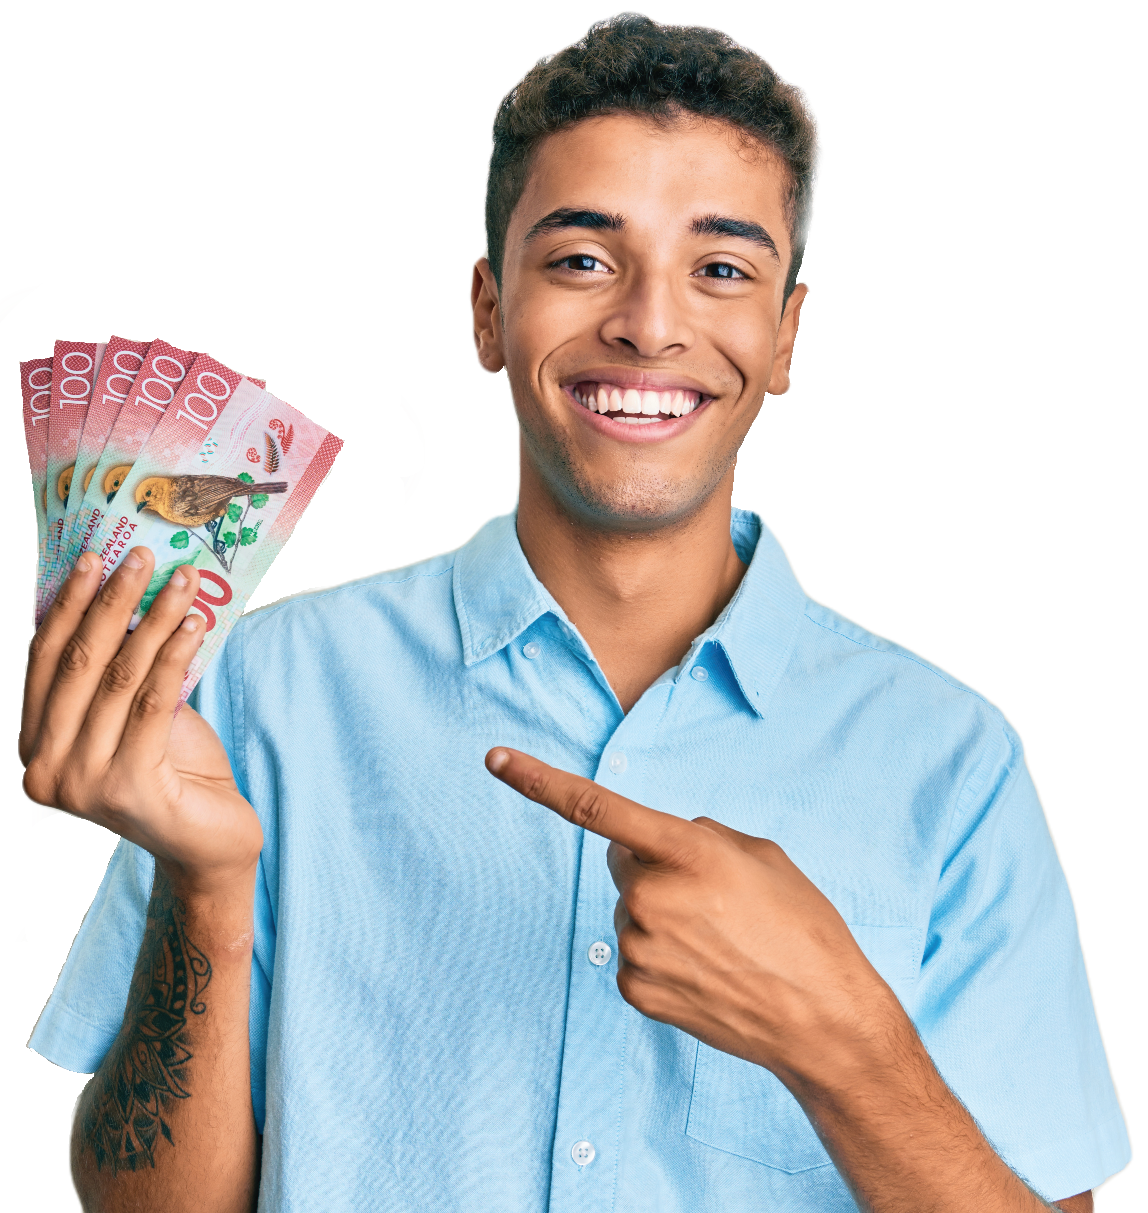 Offers Top Cash